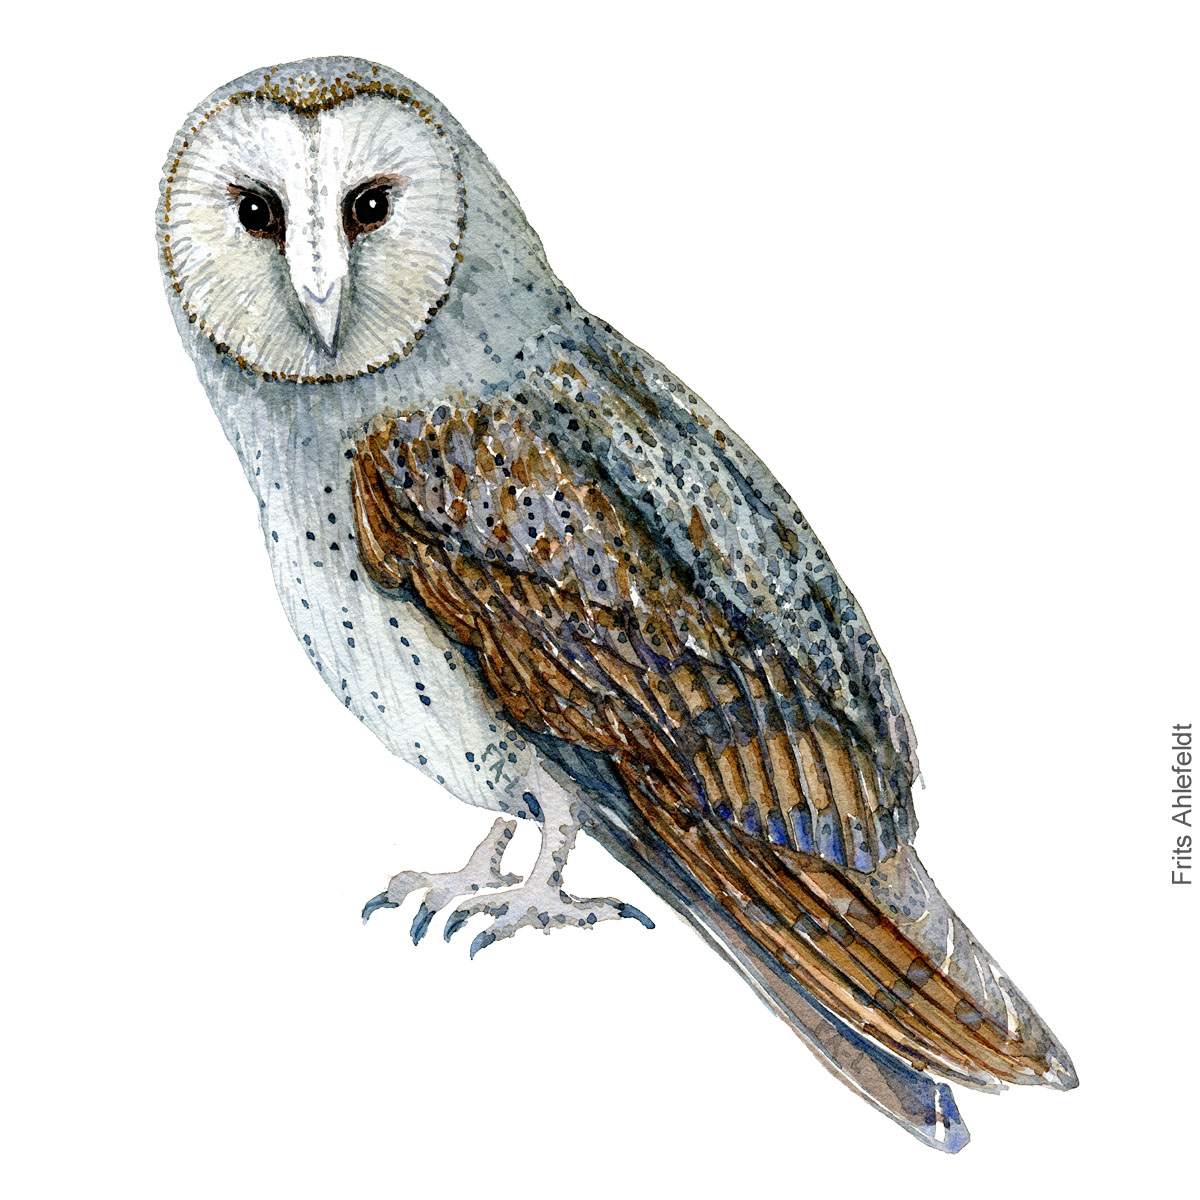 Barn owl - Slorugle Akvarel. Watercolor bird illustration by Frits Ahlefeldt